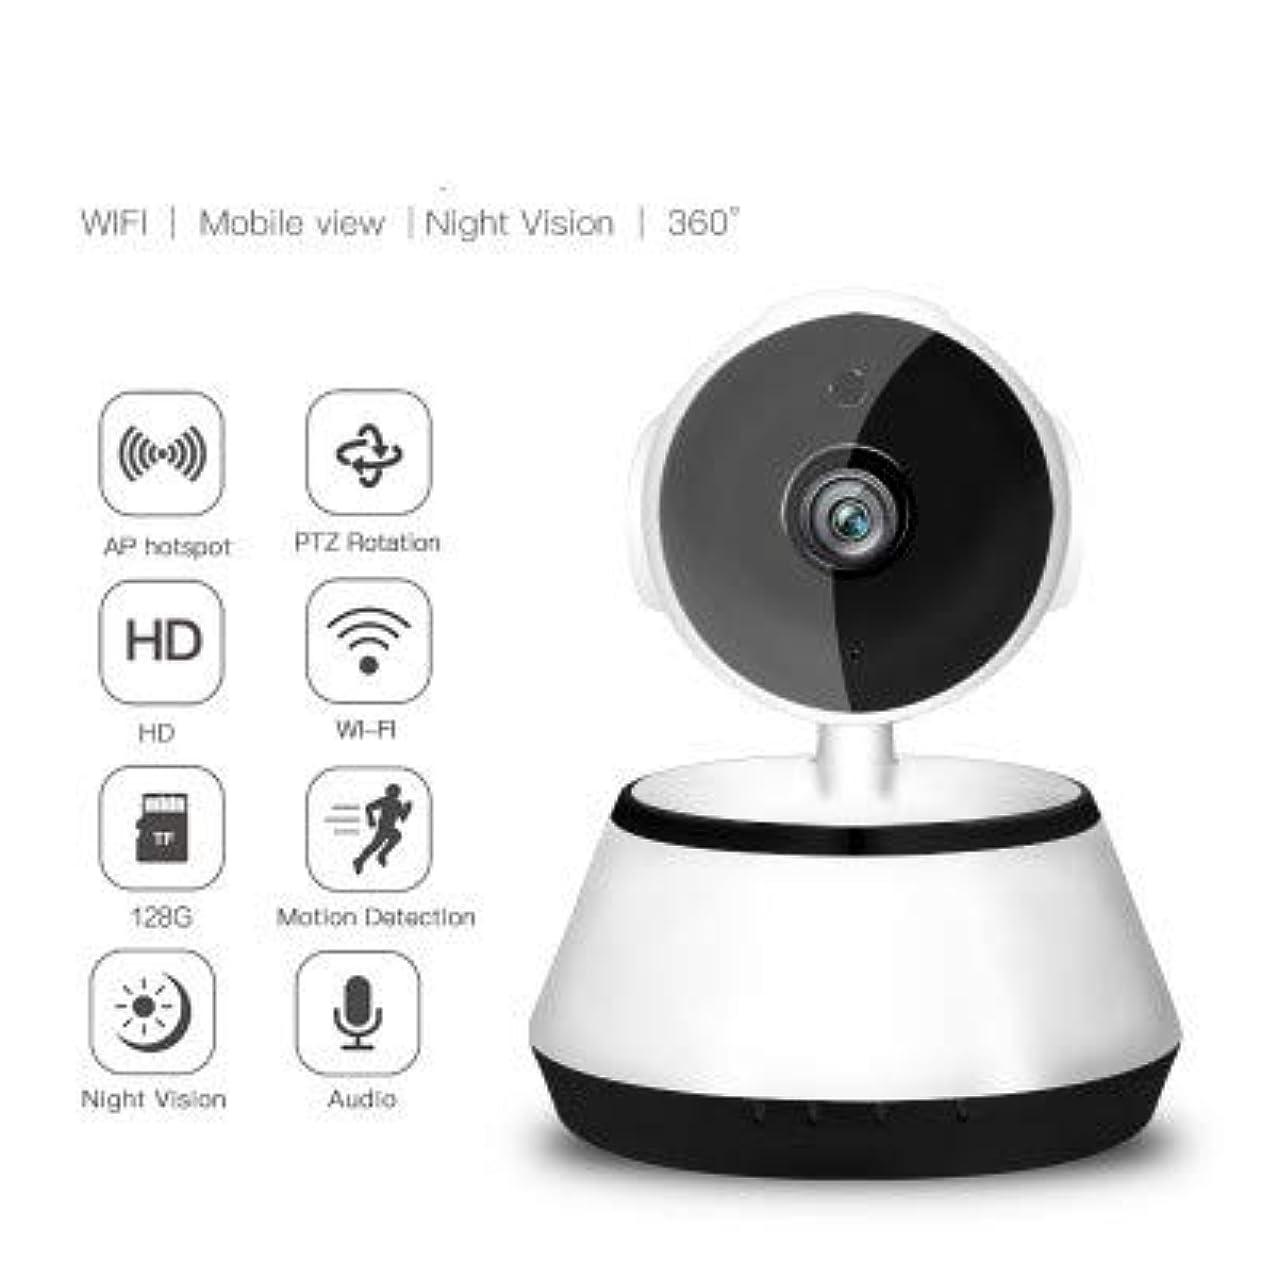 House Security Wireless HD 720p IP Camera Pan Tilt Network Security CCTV Night Vision WiFi Cam Black